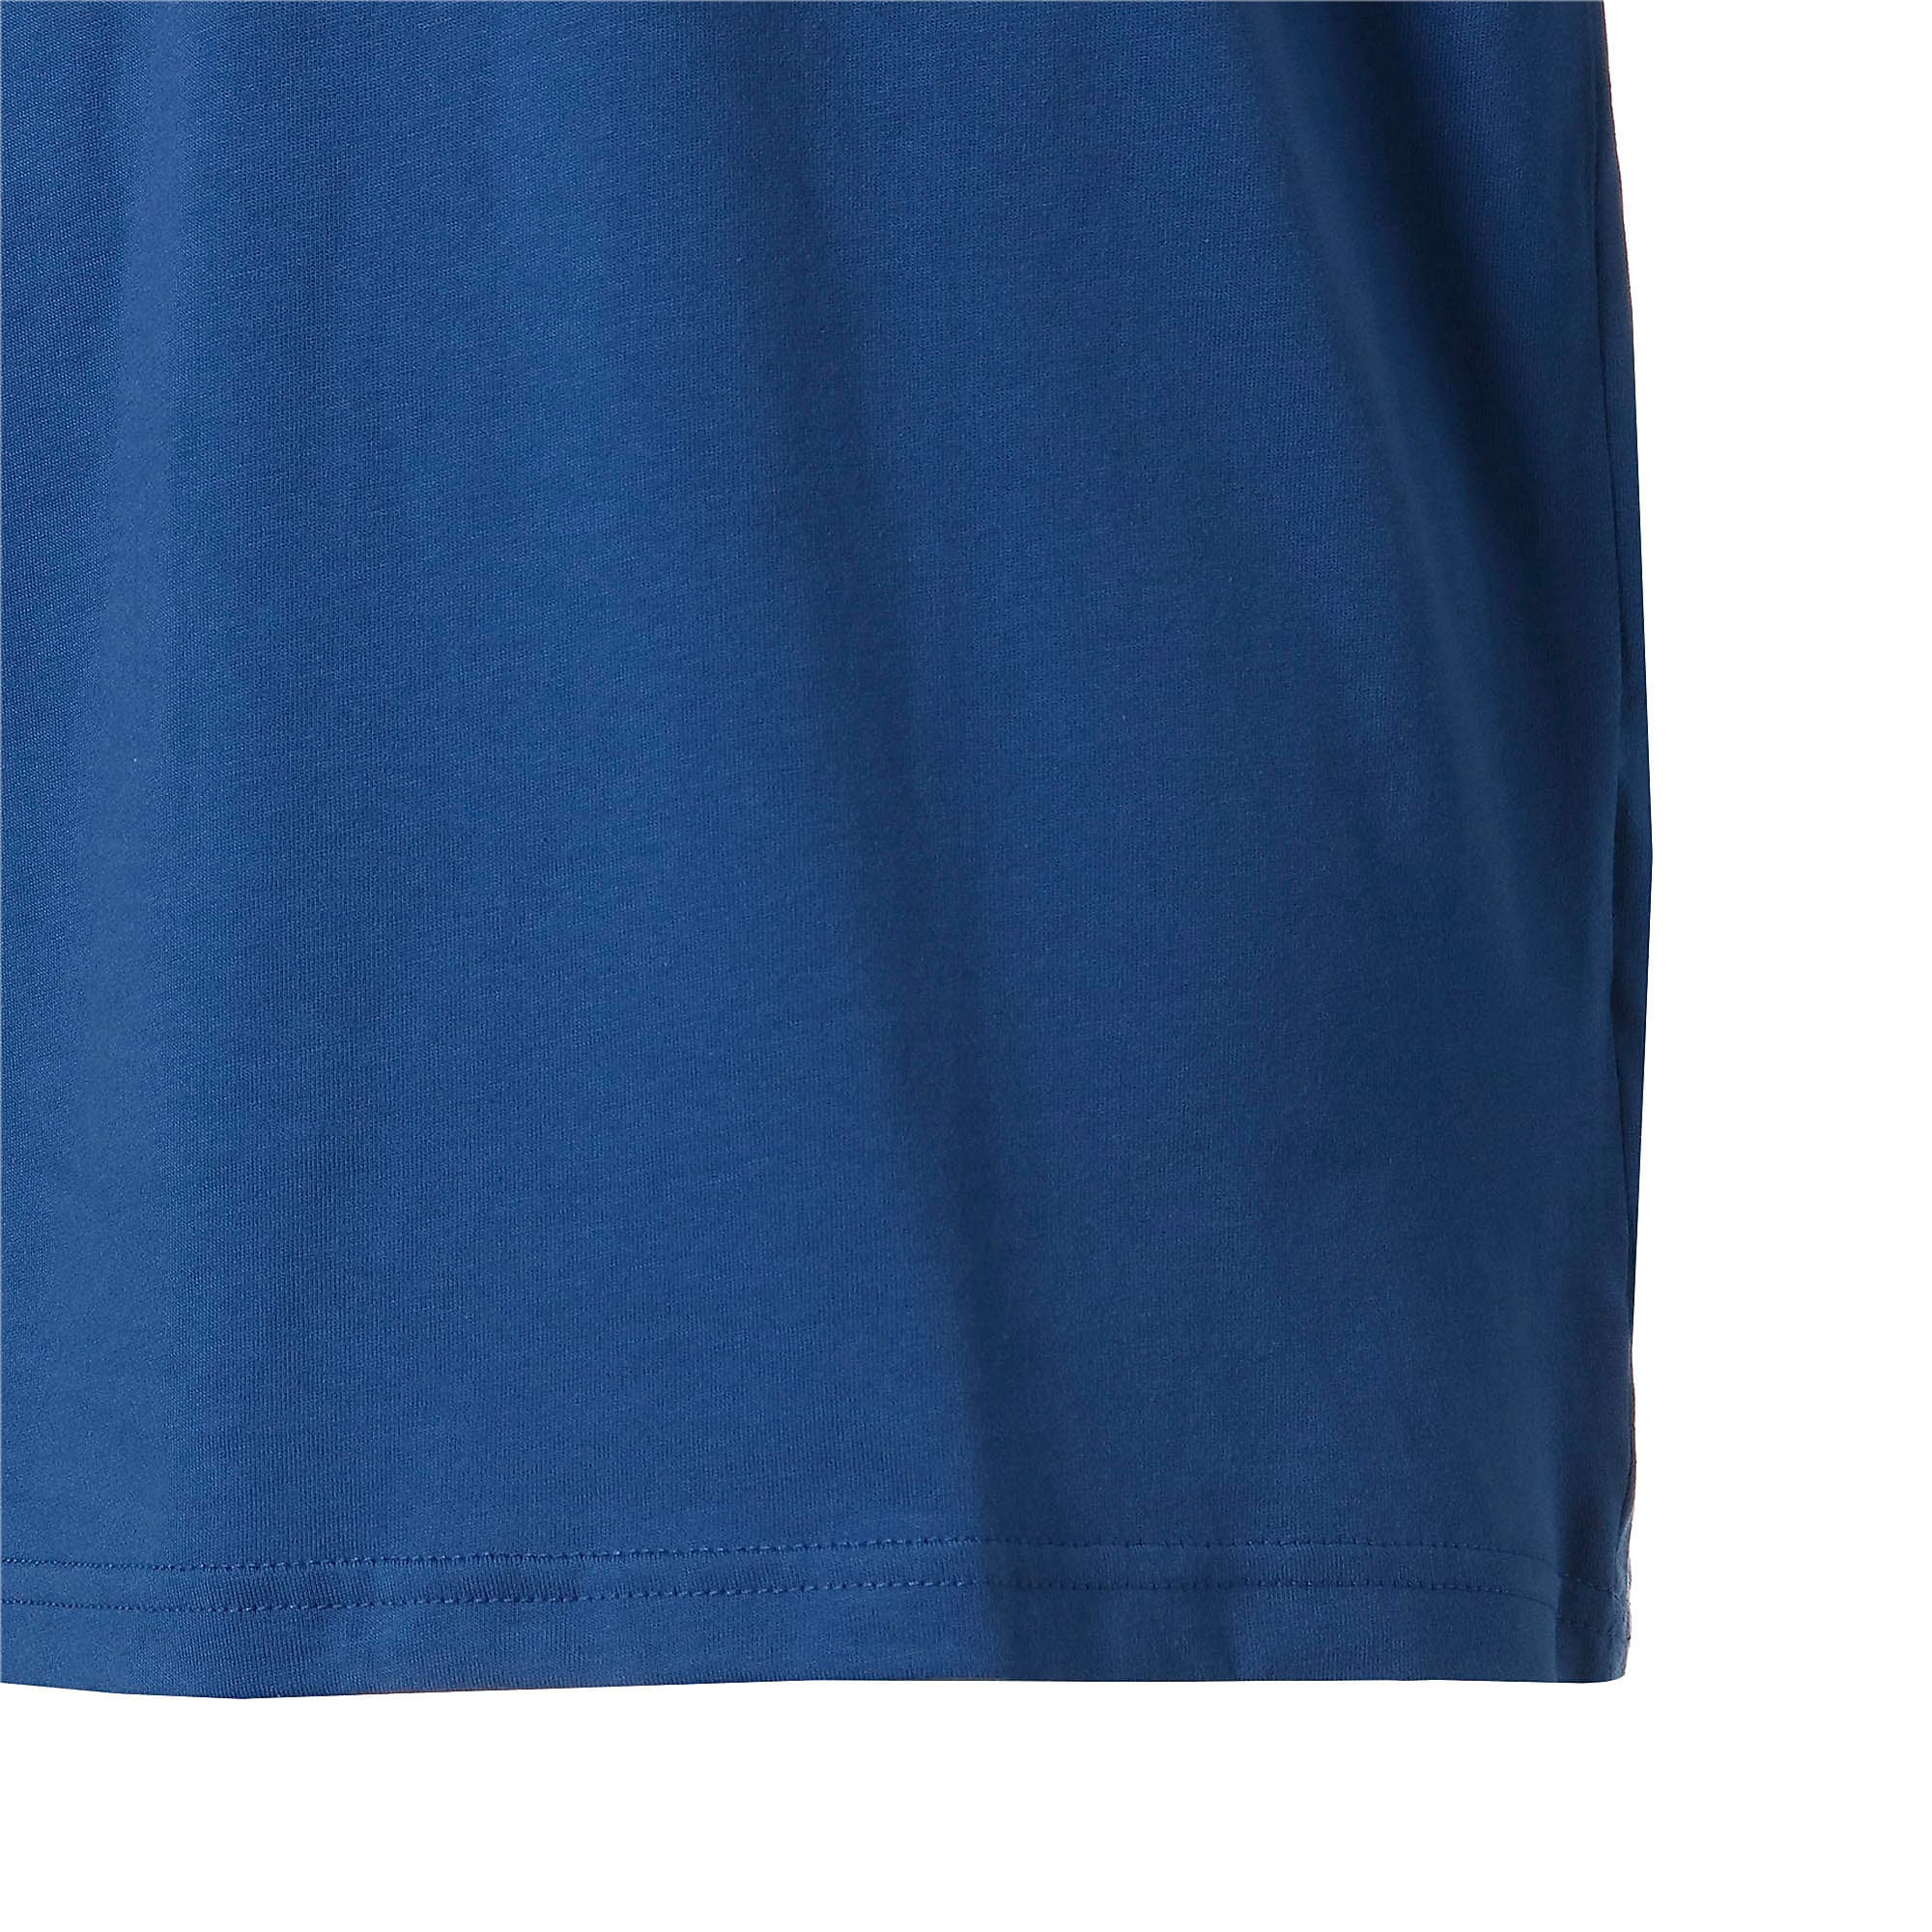 Thumbnail 9 of PUMA x LES BENJAMINS Tシャツ, Galaxy Blue, medium-JPN